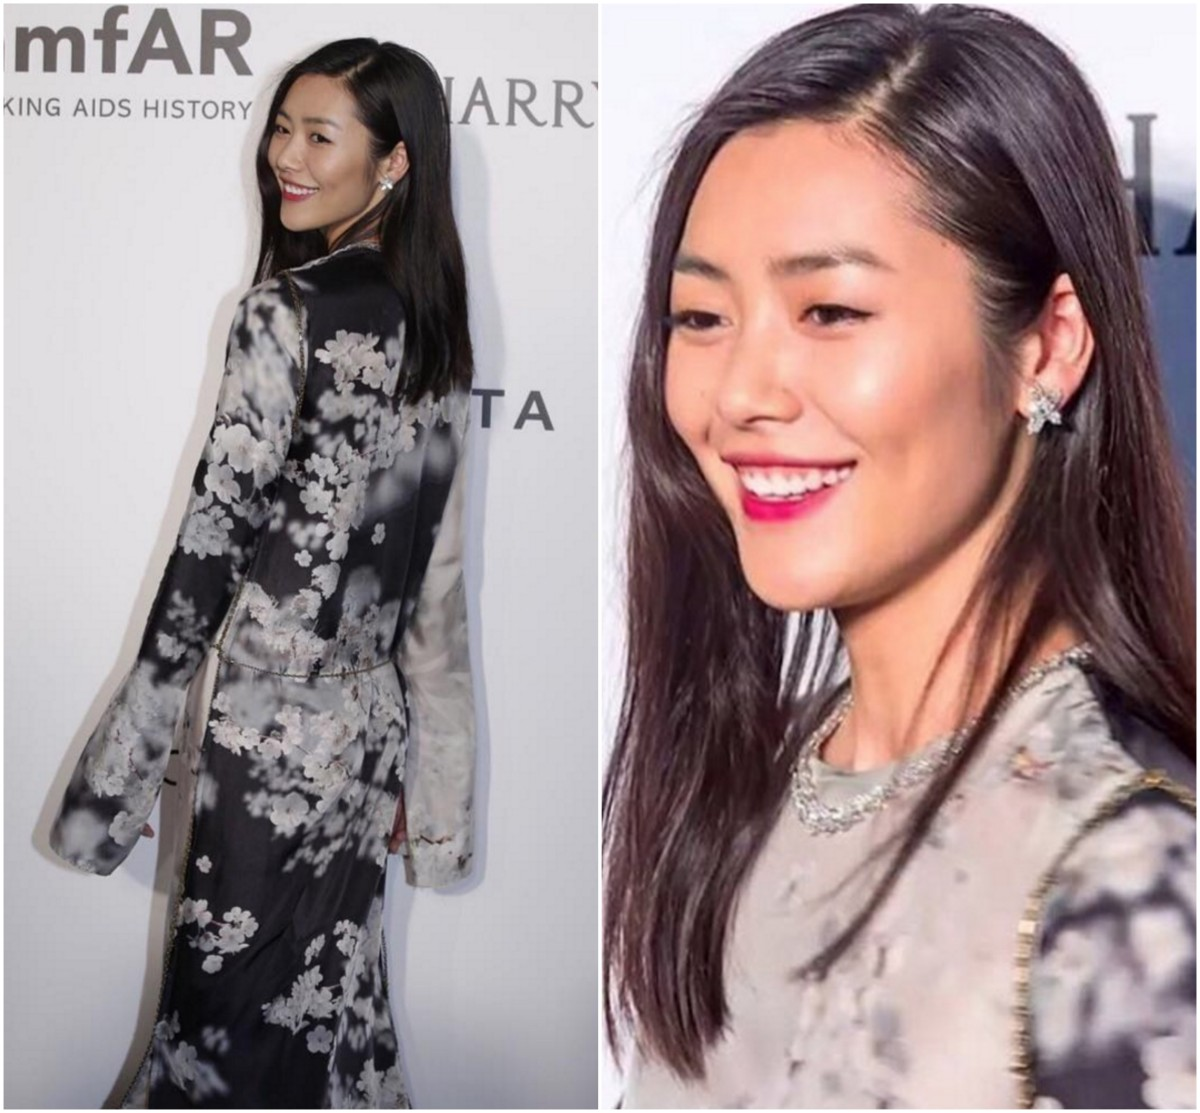 Fashion Recap: The Best Dressed at amfAR's Hong Kong Charity Ball